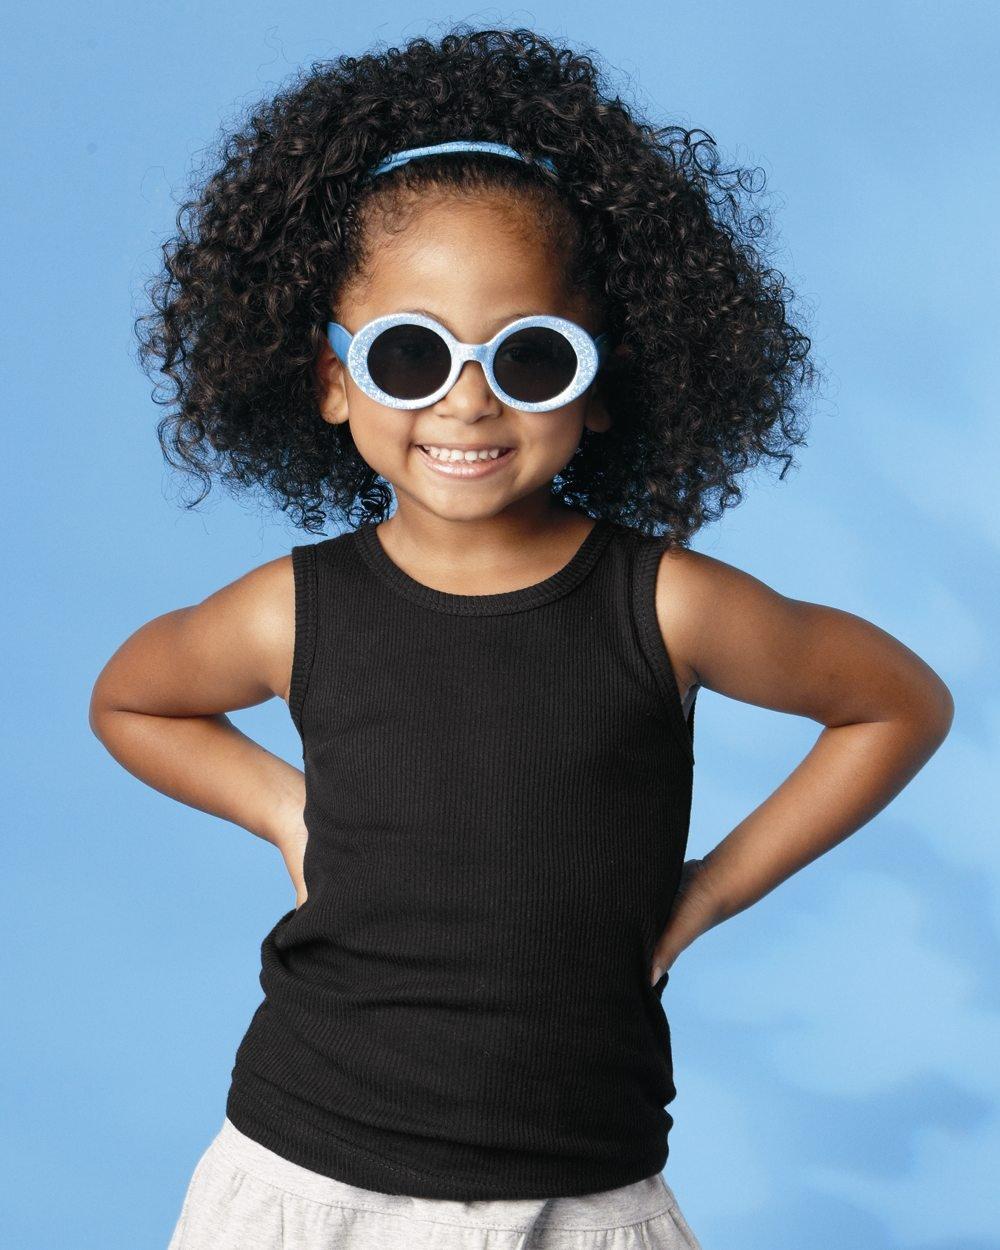 Image result for black female toddler